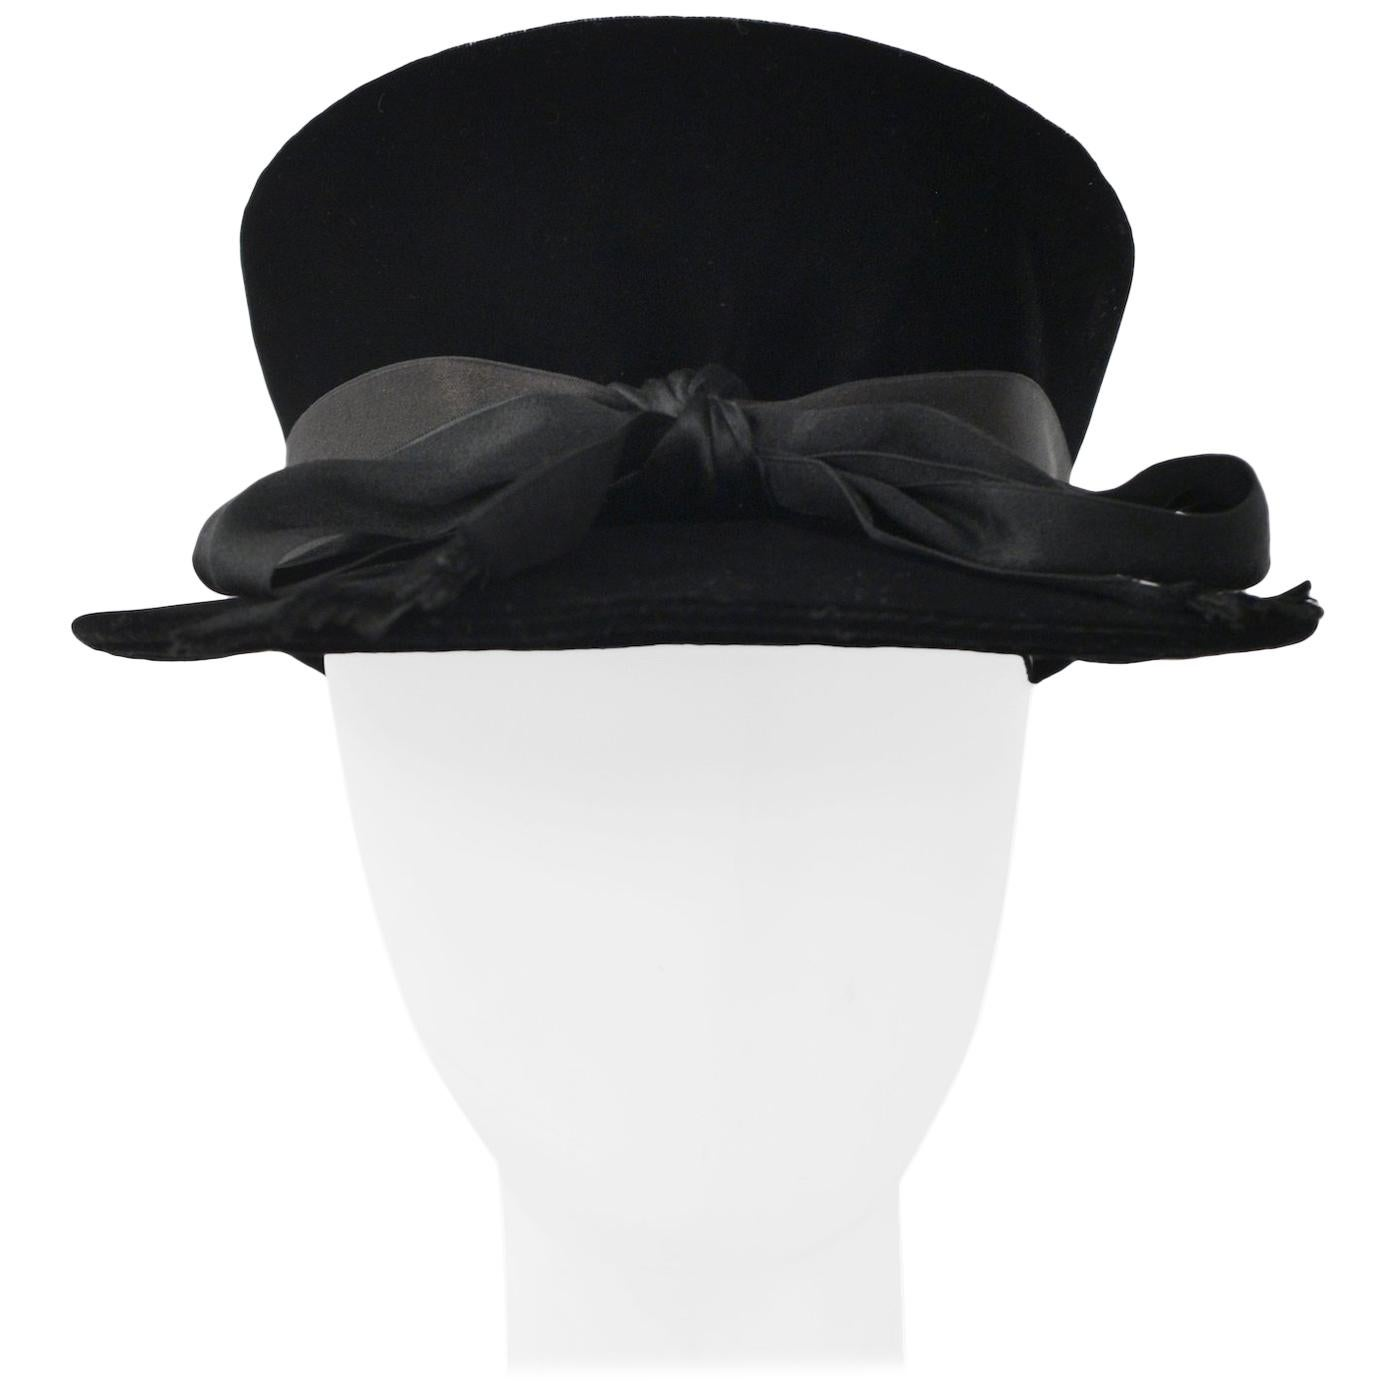 c9095dbf1a4 Vintage and Designer Hats - 1